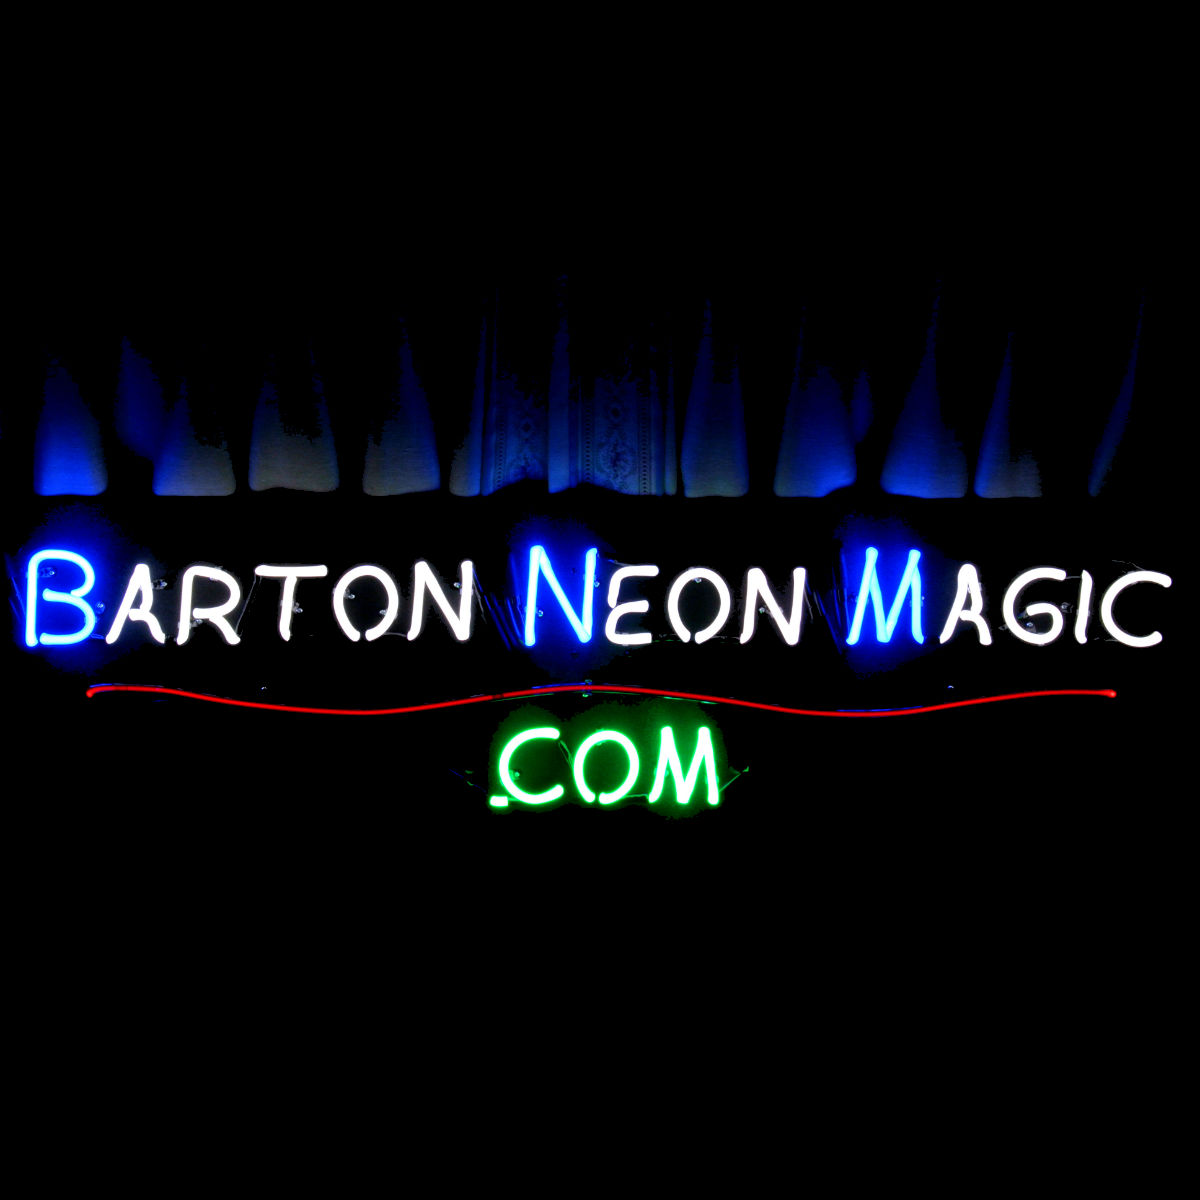 BartonNeonMagic.com - Custom Neon Lighting by John Barton - Famous USA Neon Glass Artist